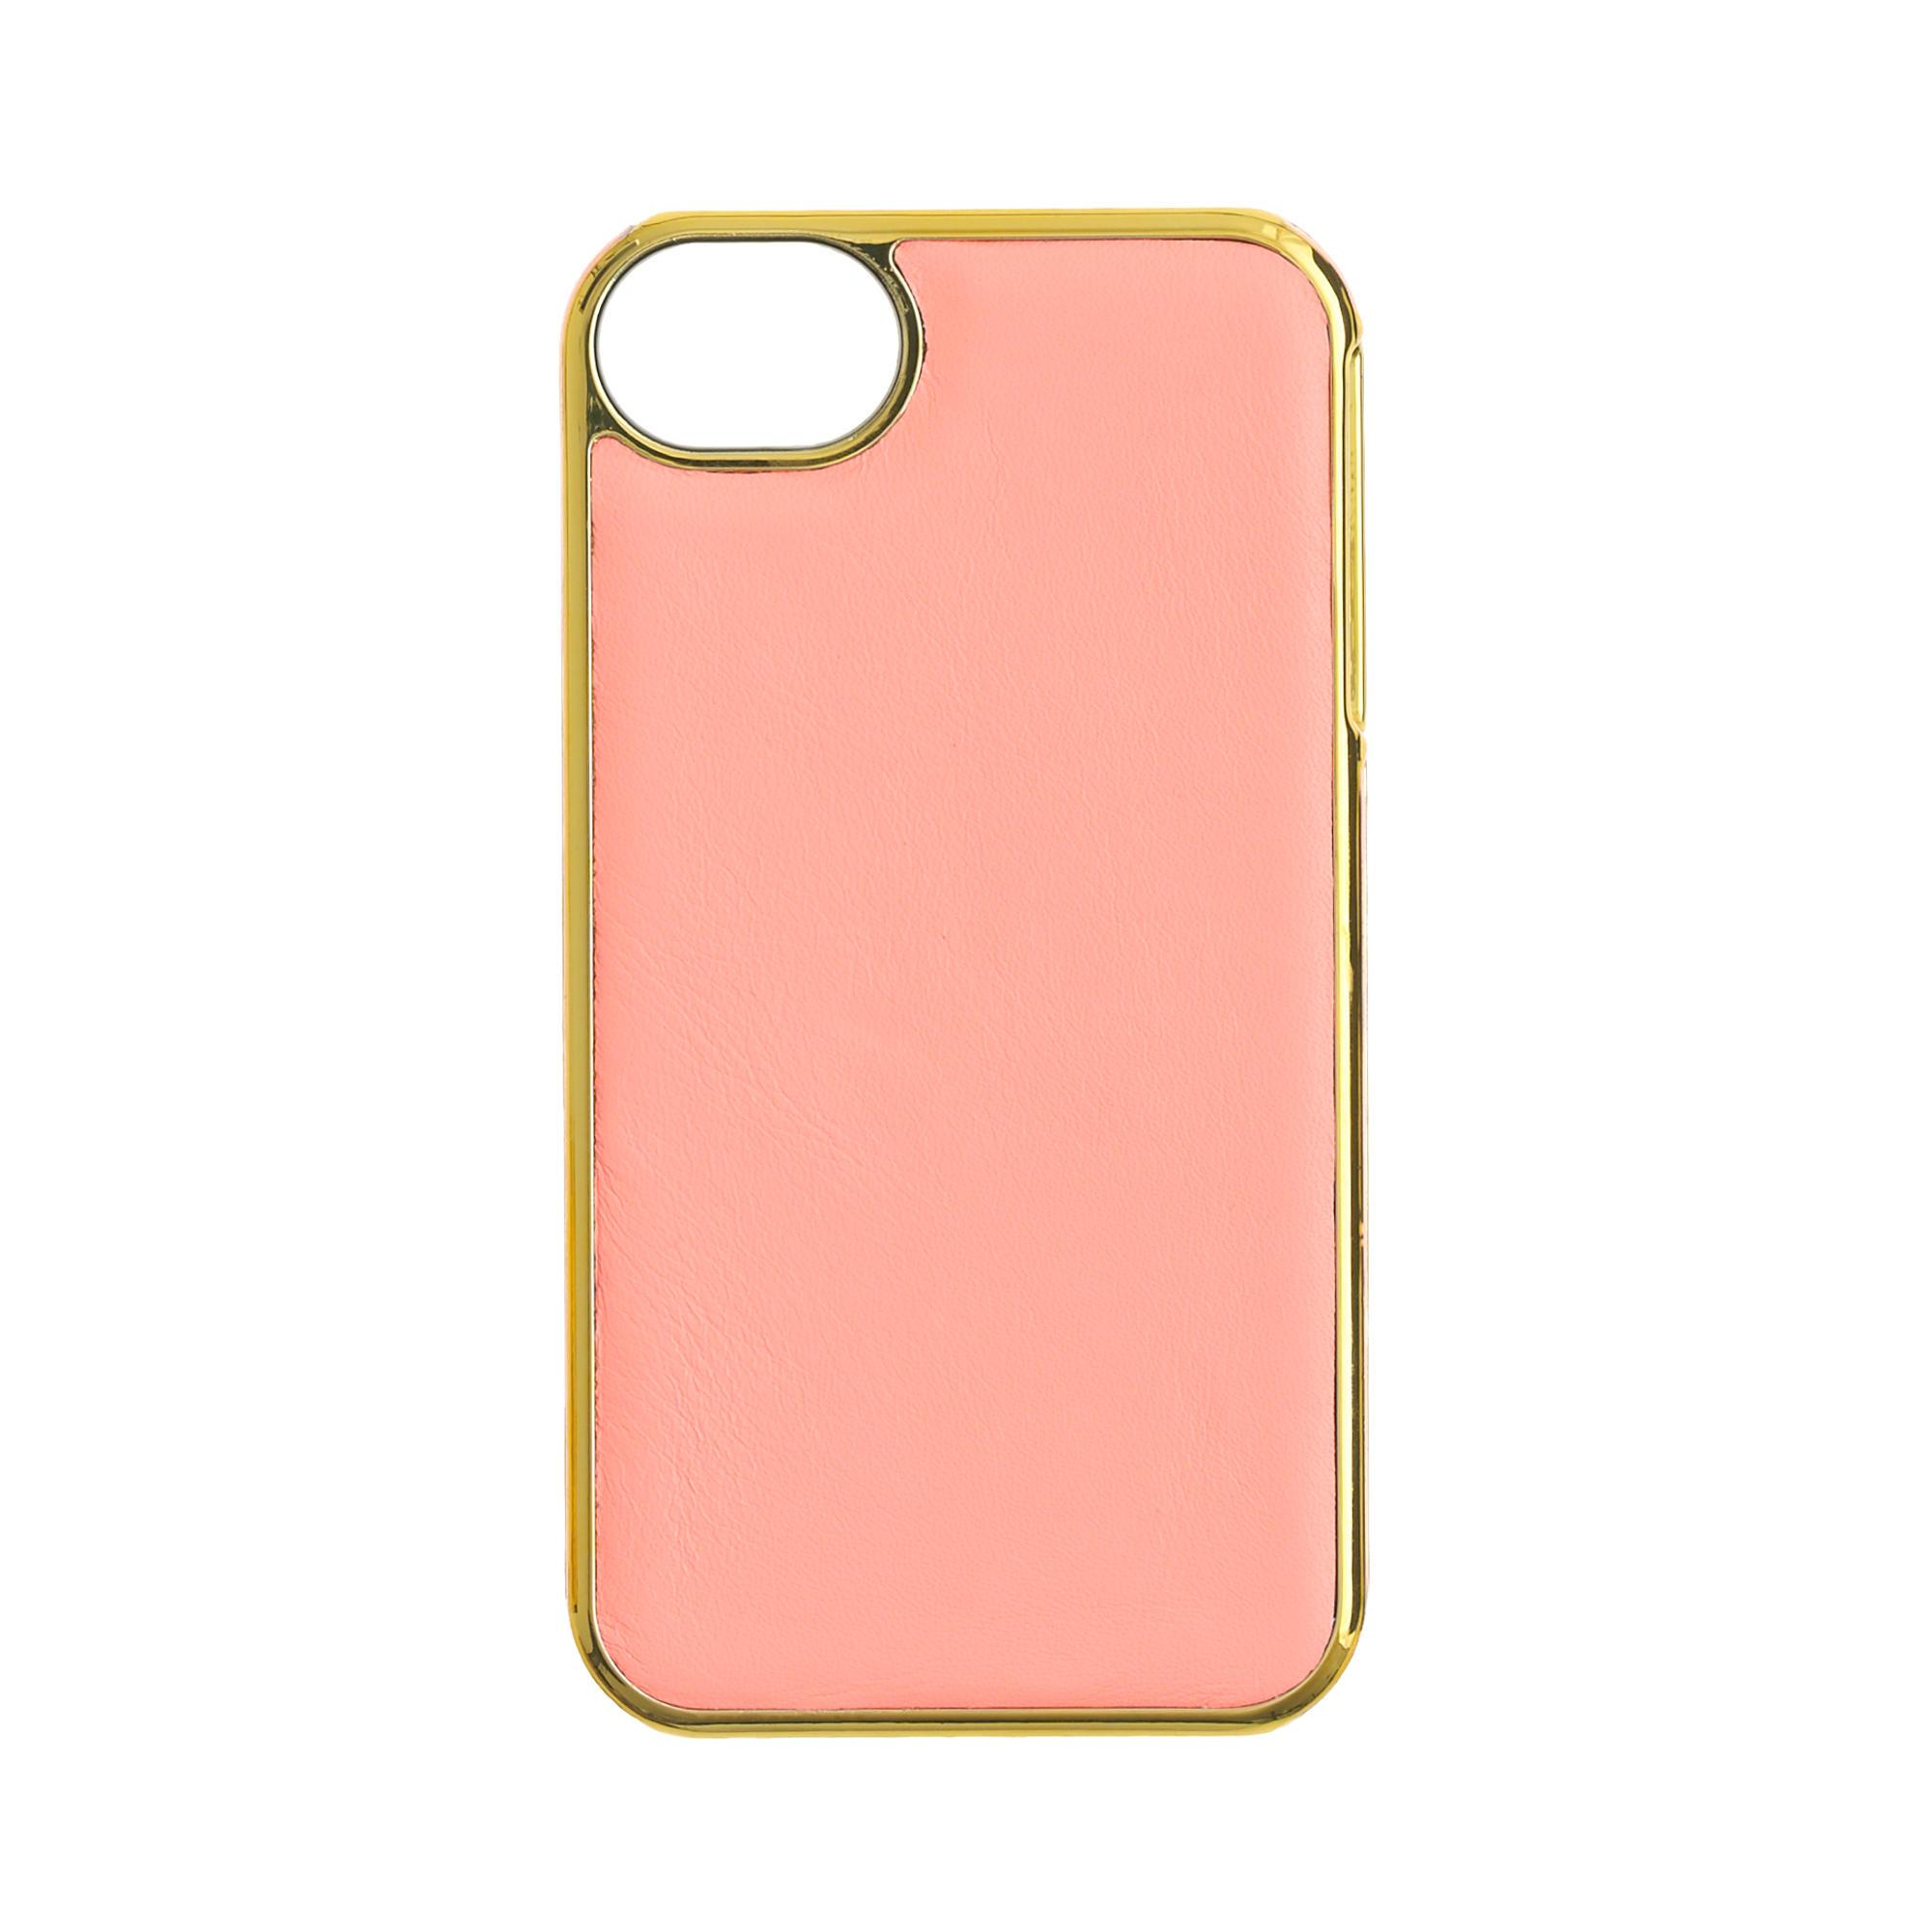 J Crew Iphone  Case Leather